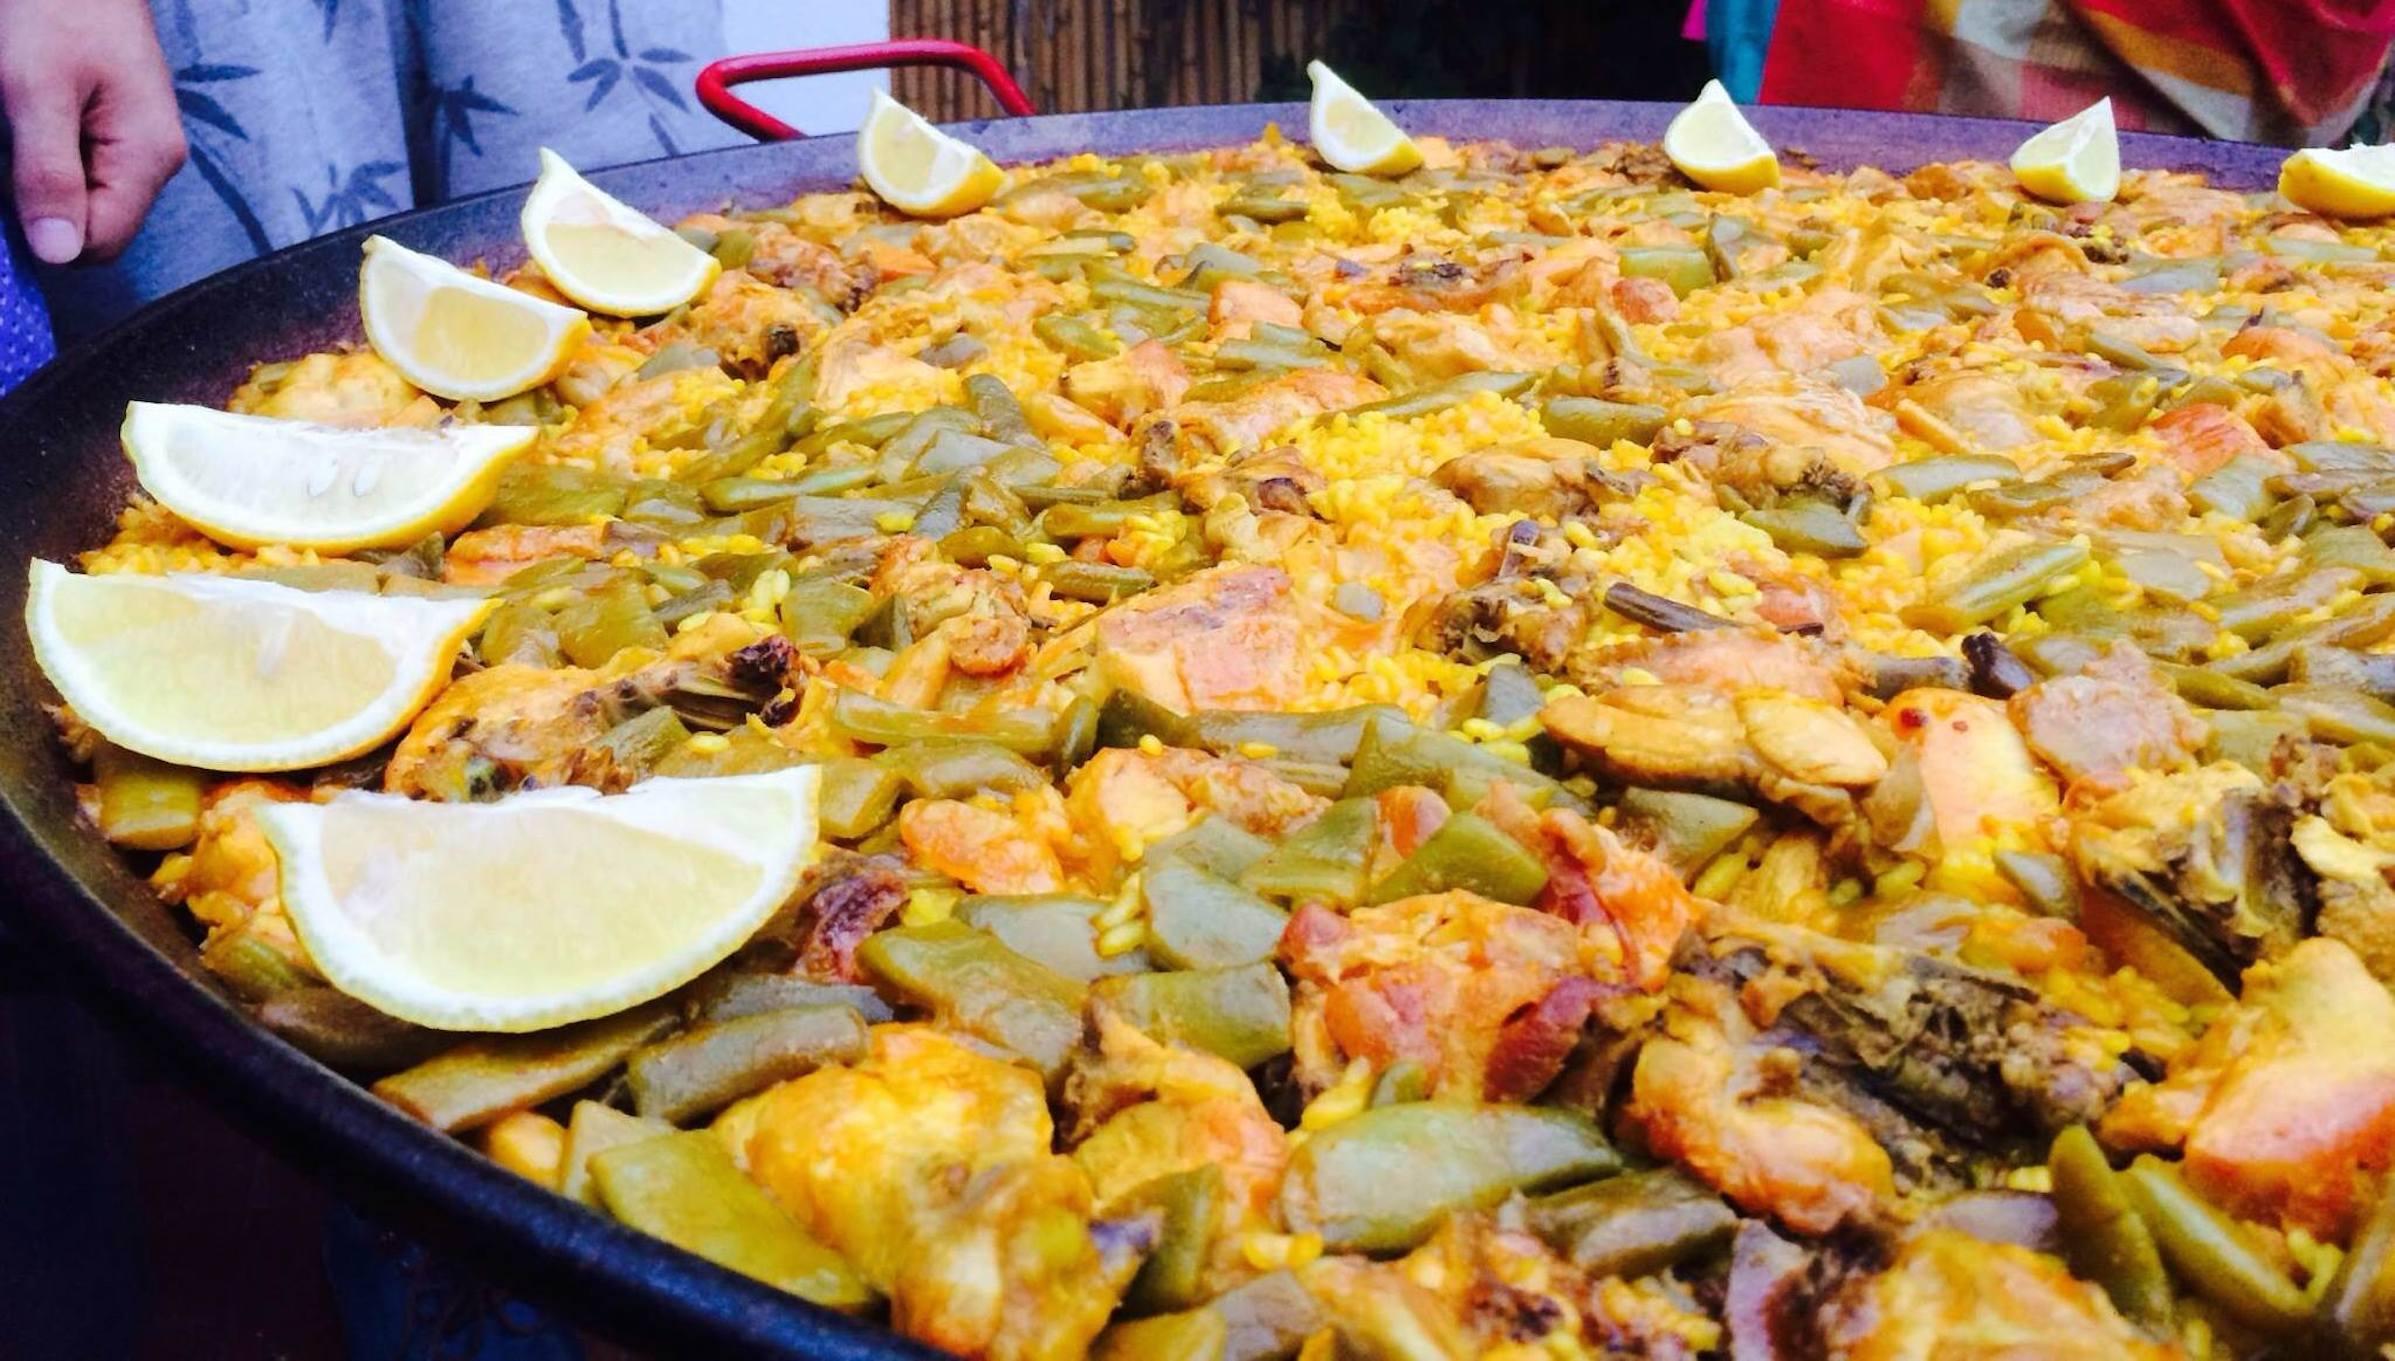 Talleres de cocina en espa ol international house - Talleres de cocina en valencia ...